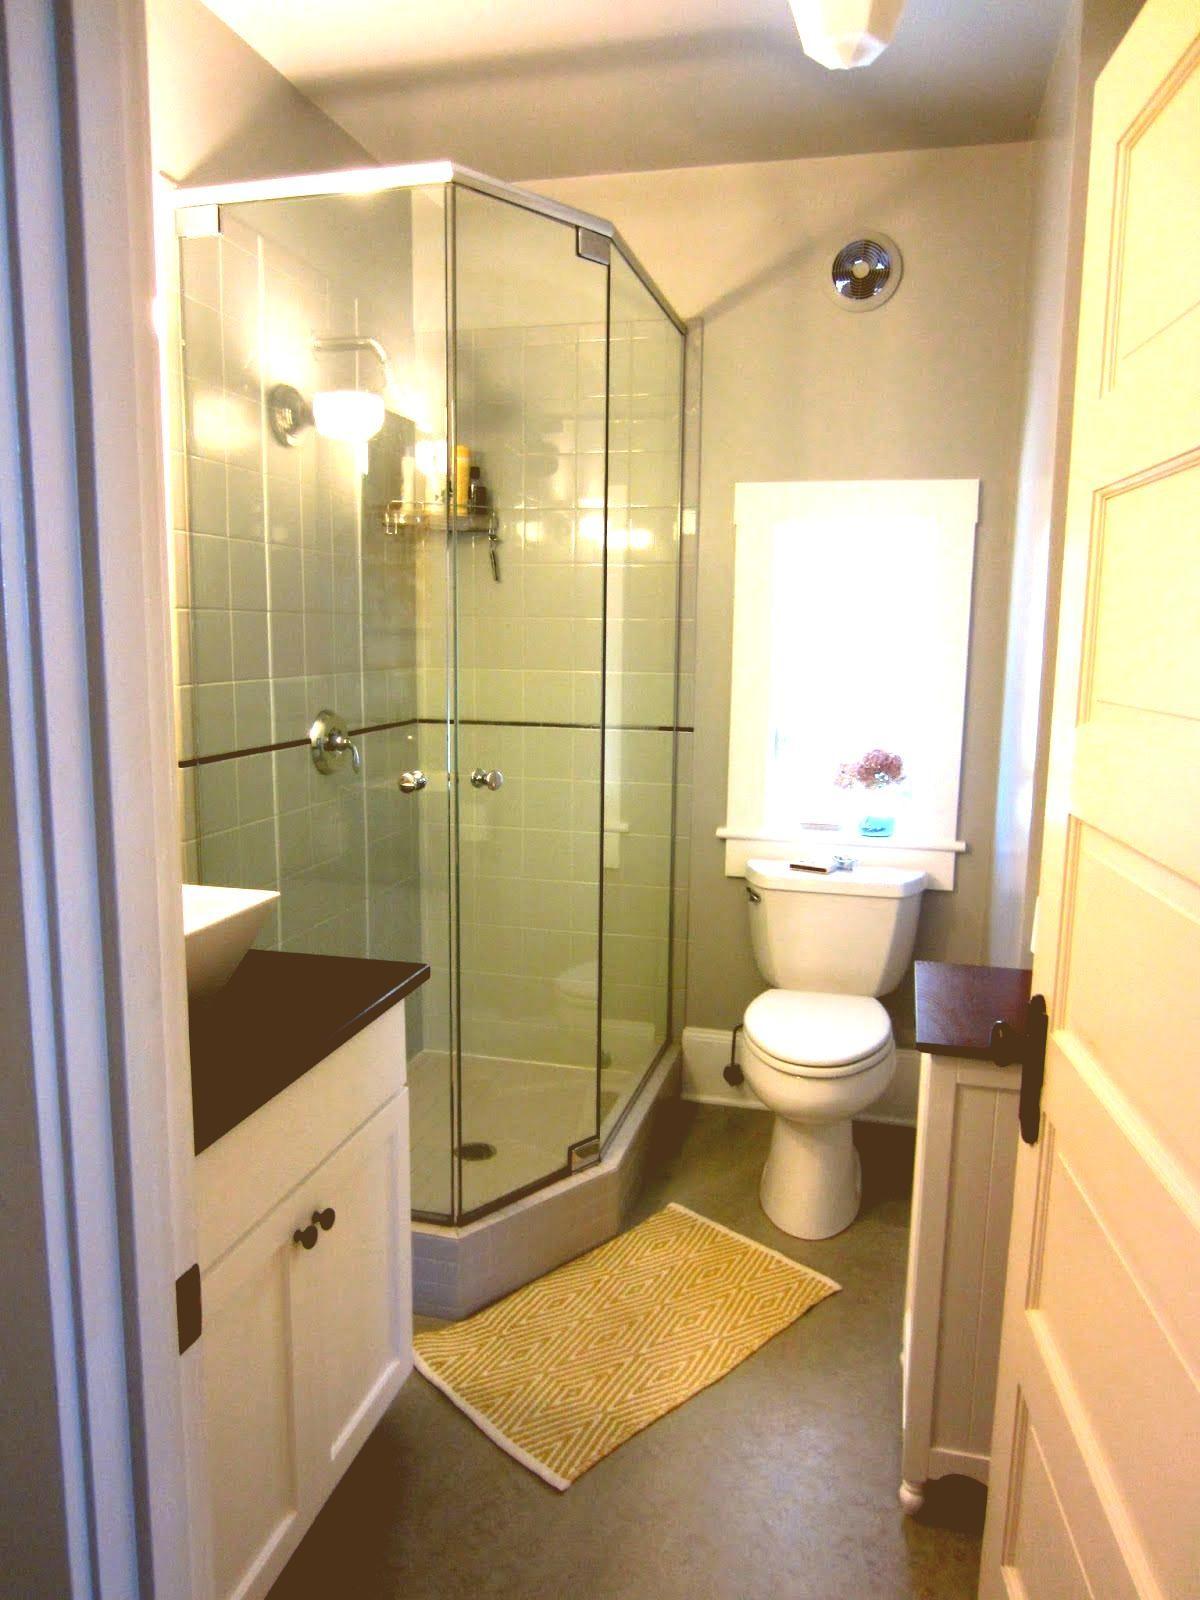 Stylish 5x5 Bathroom Layout Model - Home Sweet Home ...